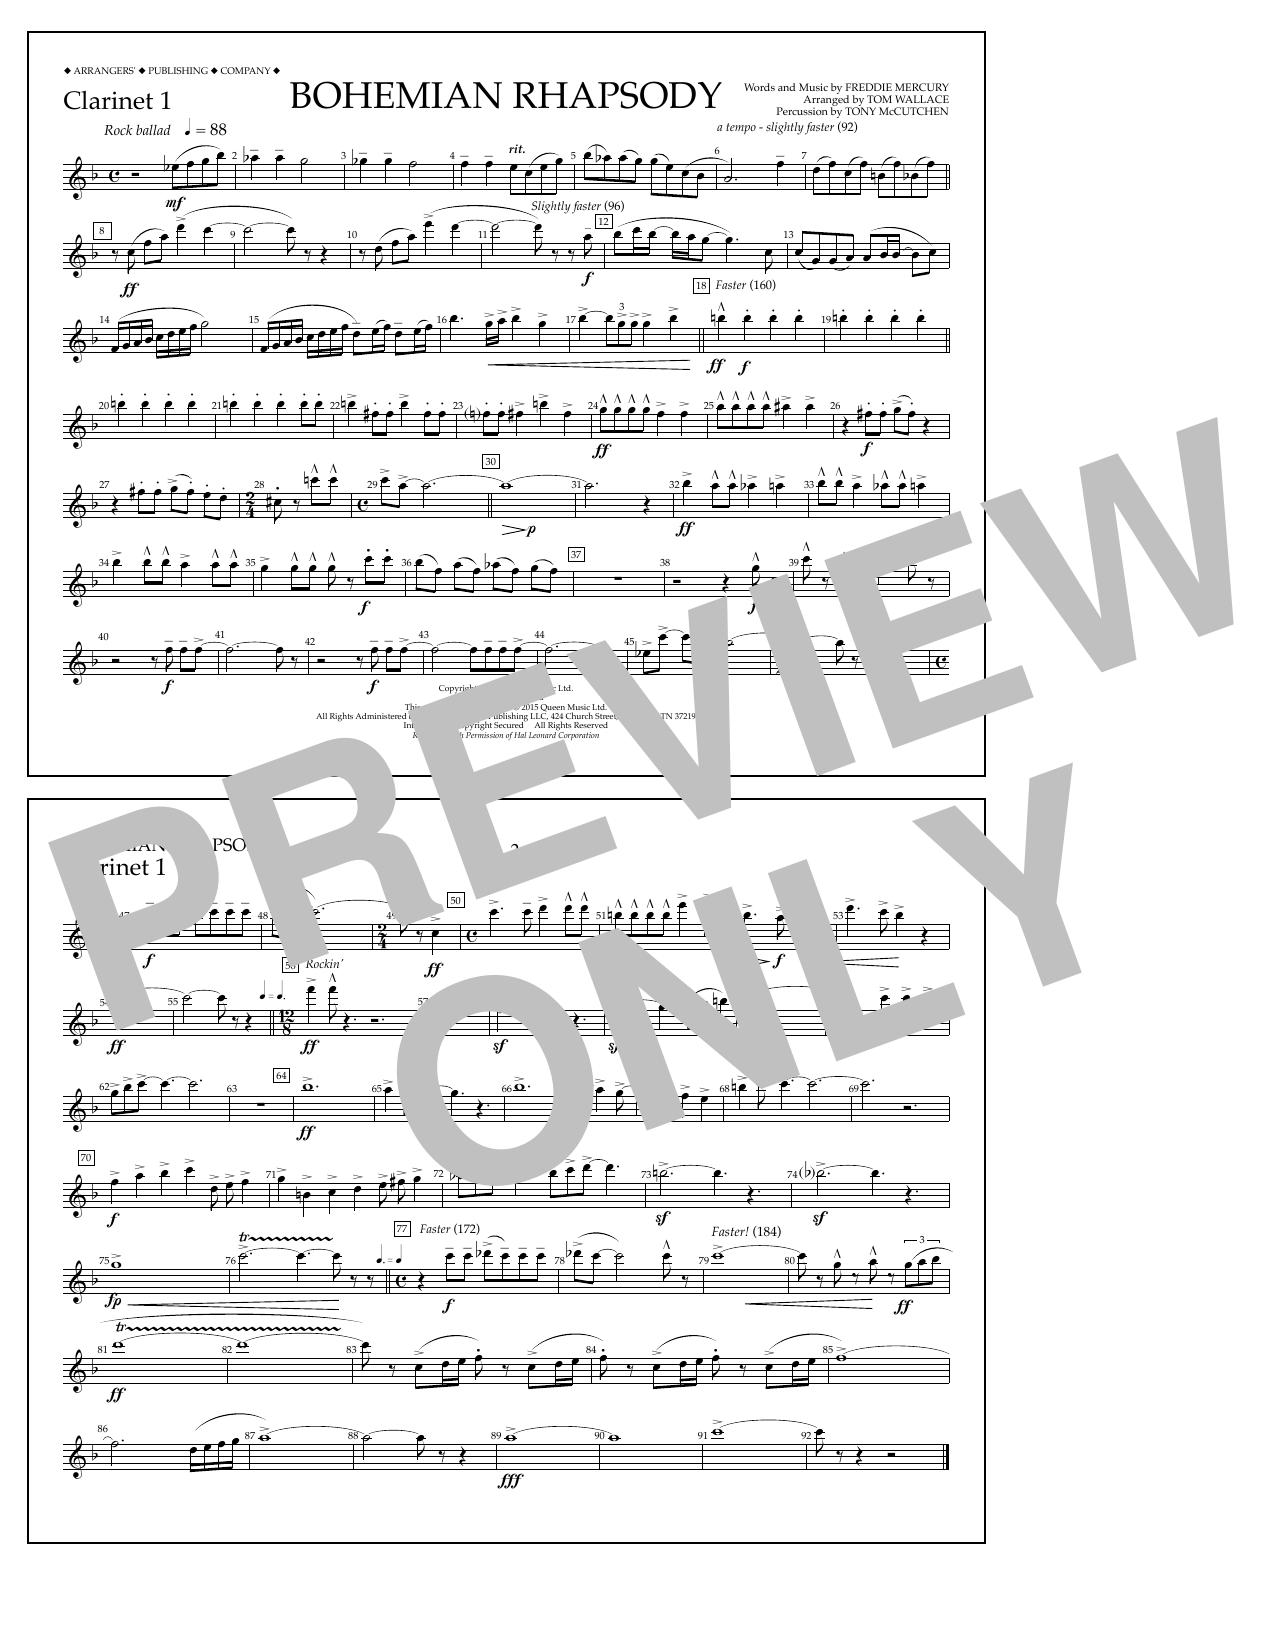 Bohemian Rhapsody - Clarinet 1 Sheet Music